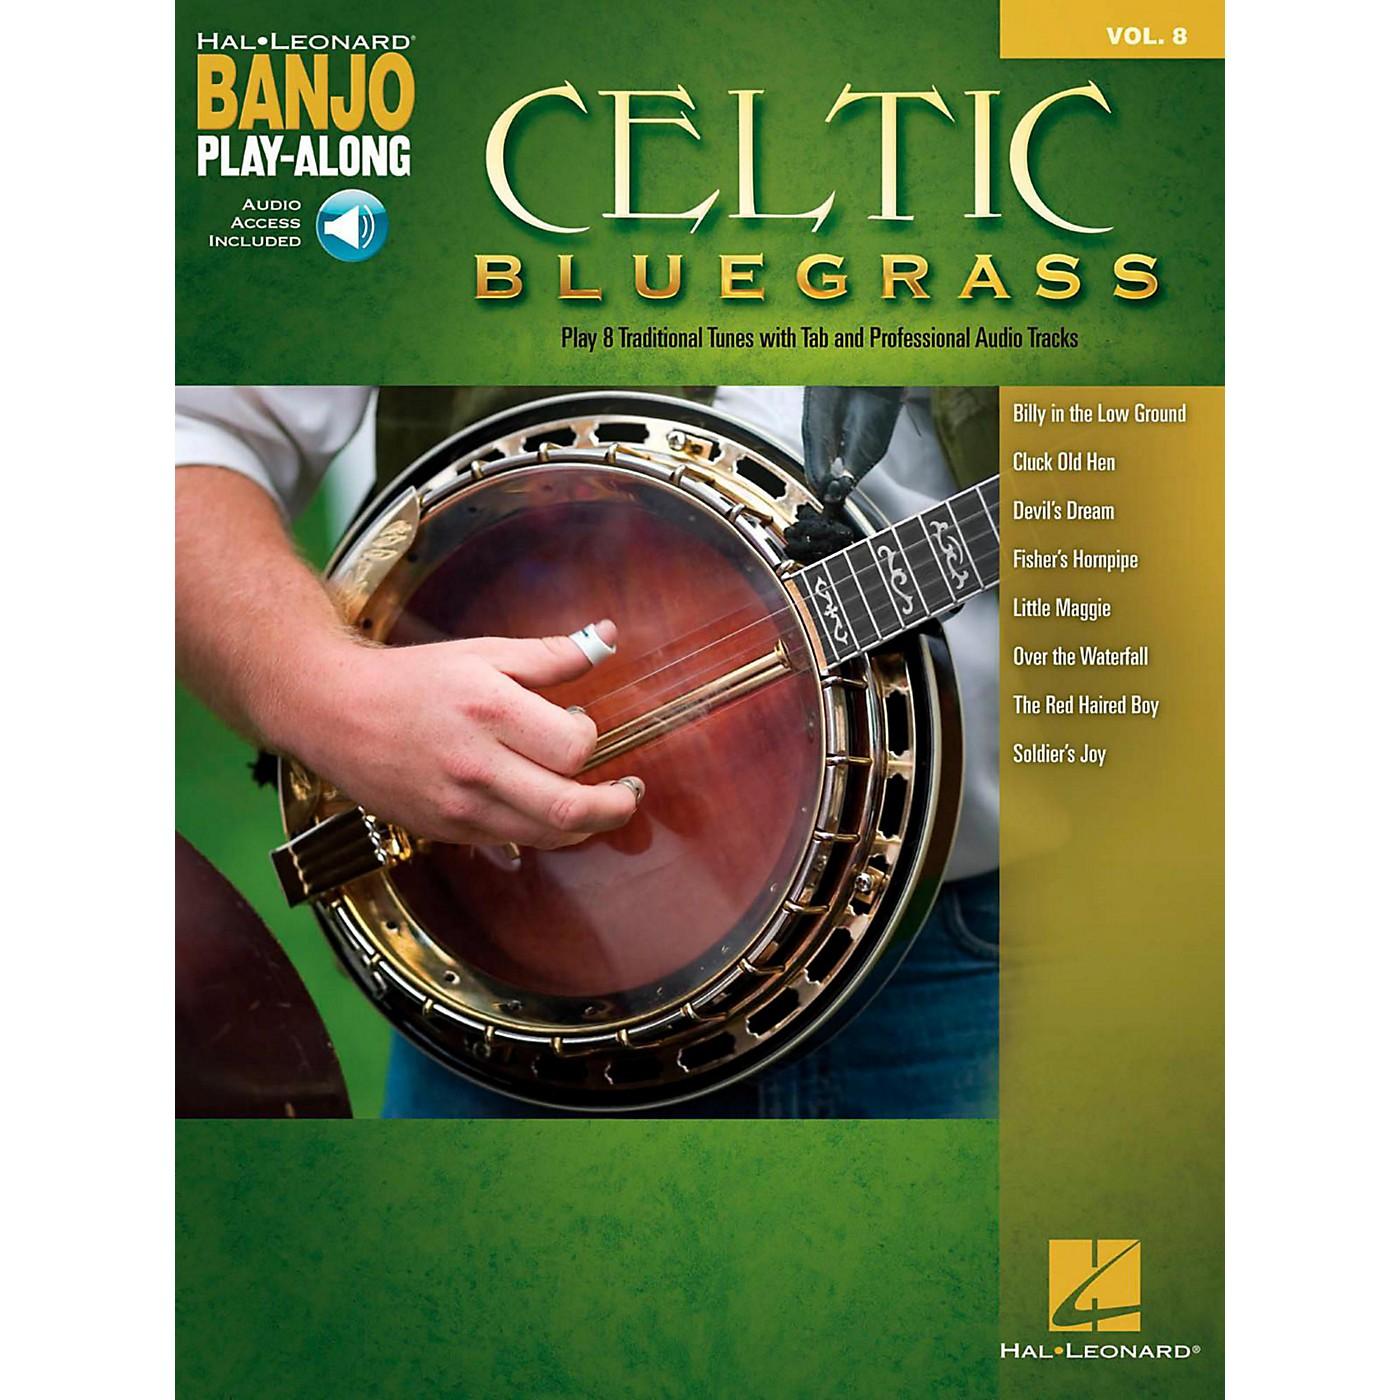 Hal Leonard Celtic Bluegrass - Banjo Play-Along Vol. 8 (Book/Audio Online) thumbnail